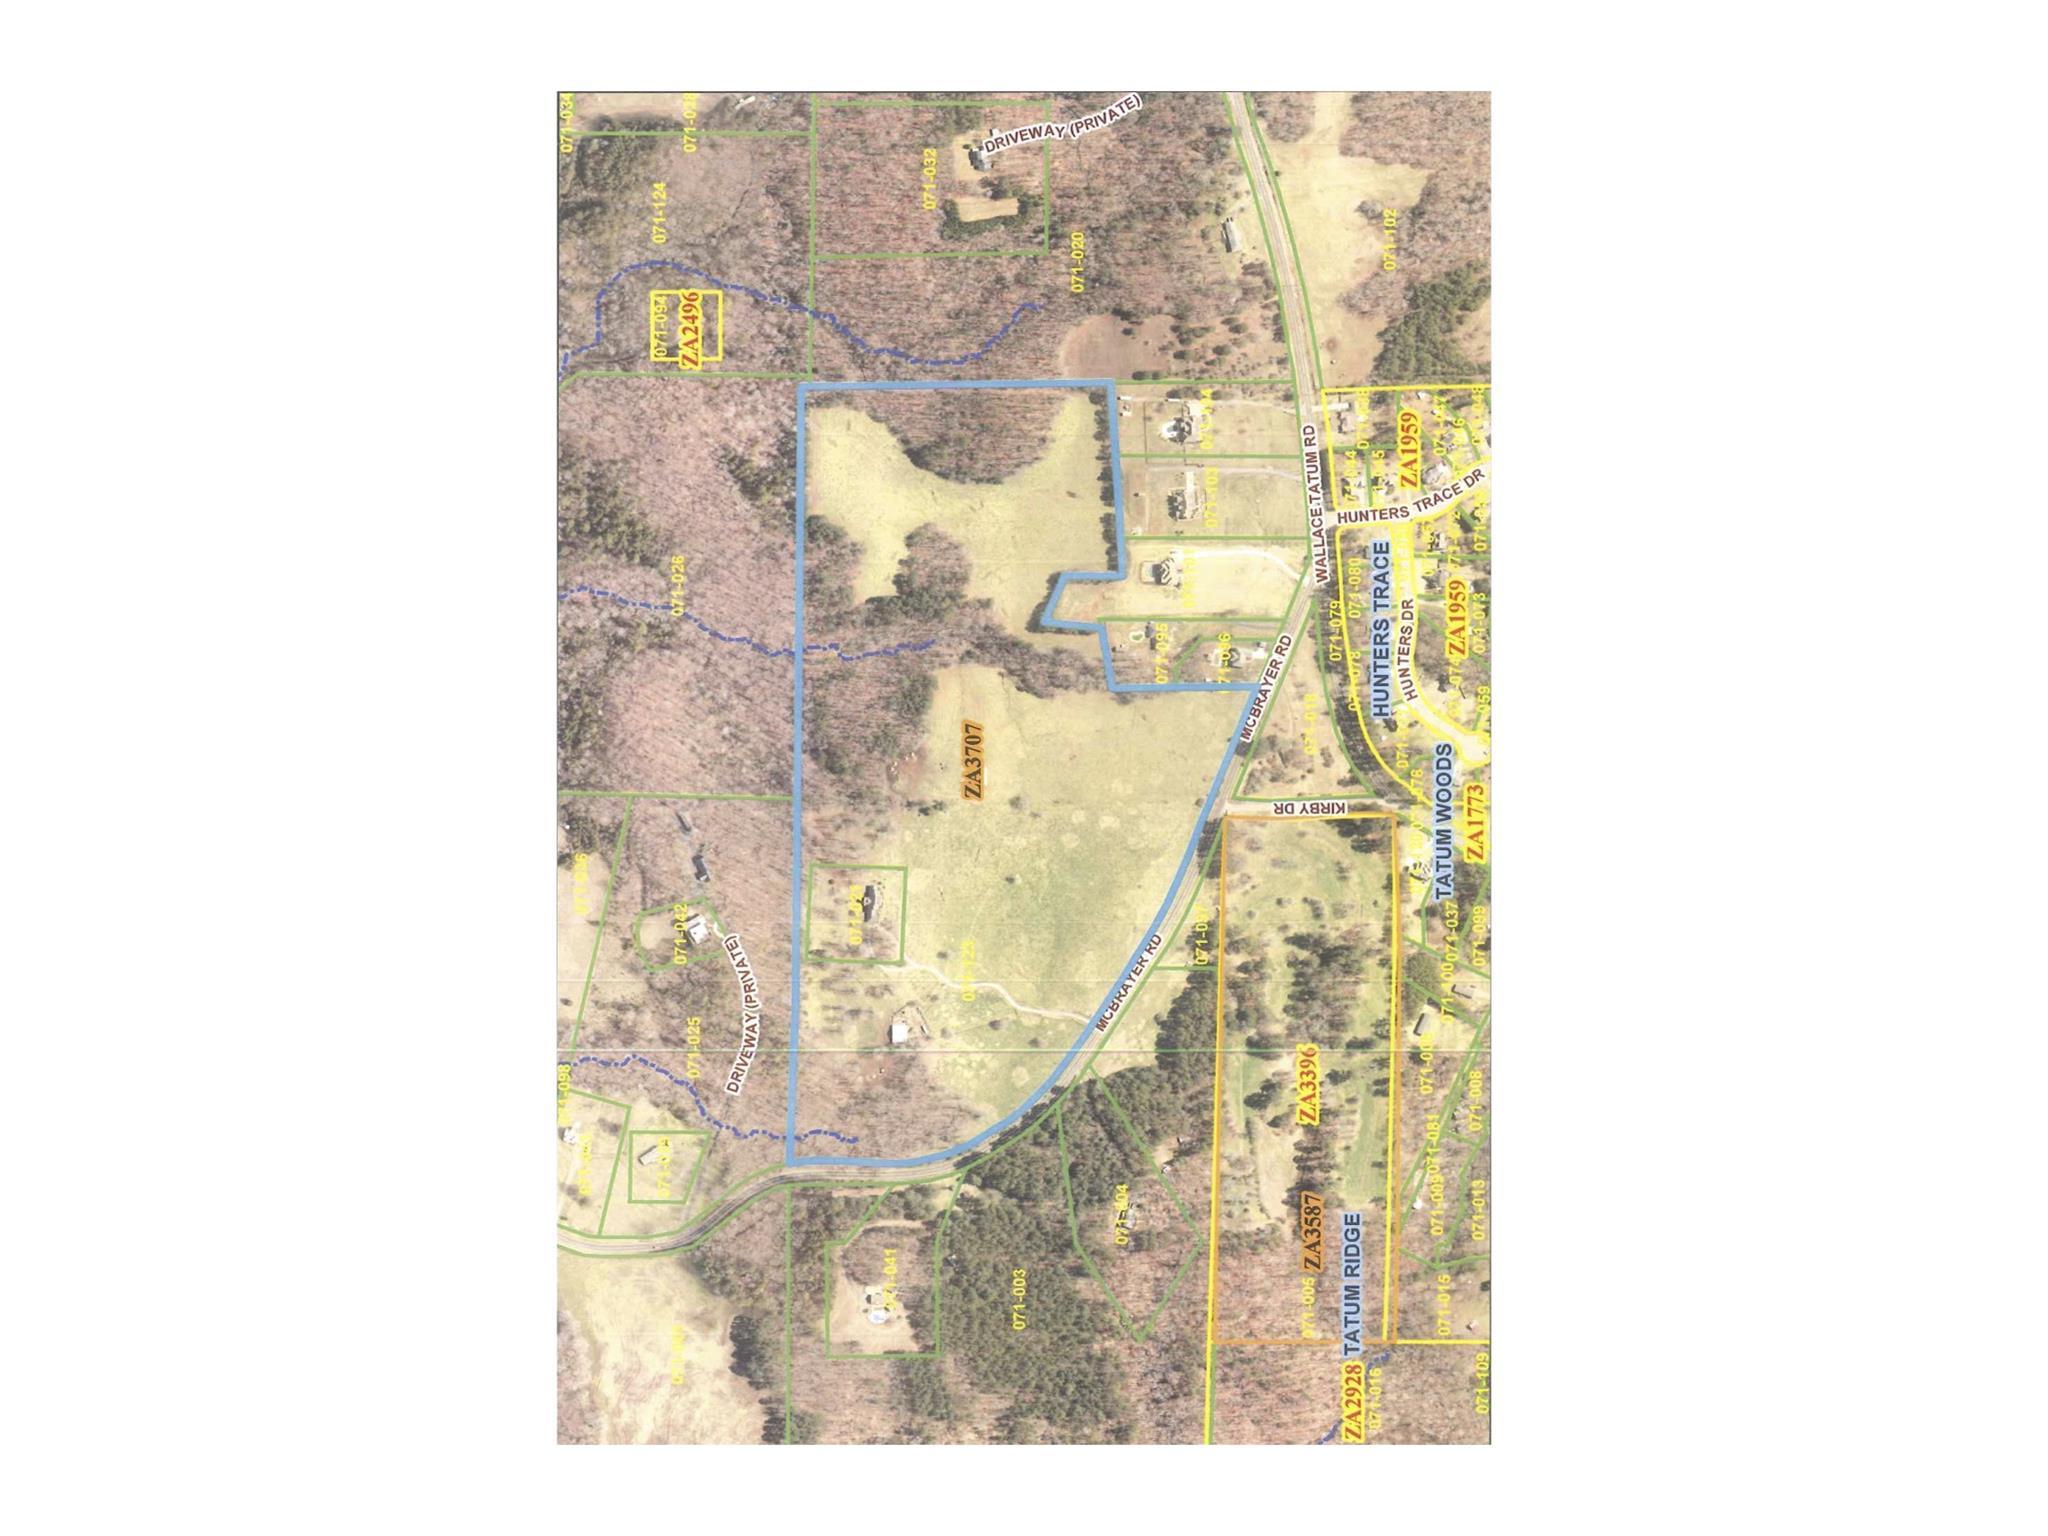 7280 Mcbrayer Road, Cumming, GA 30028